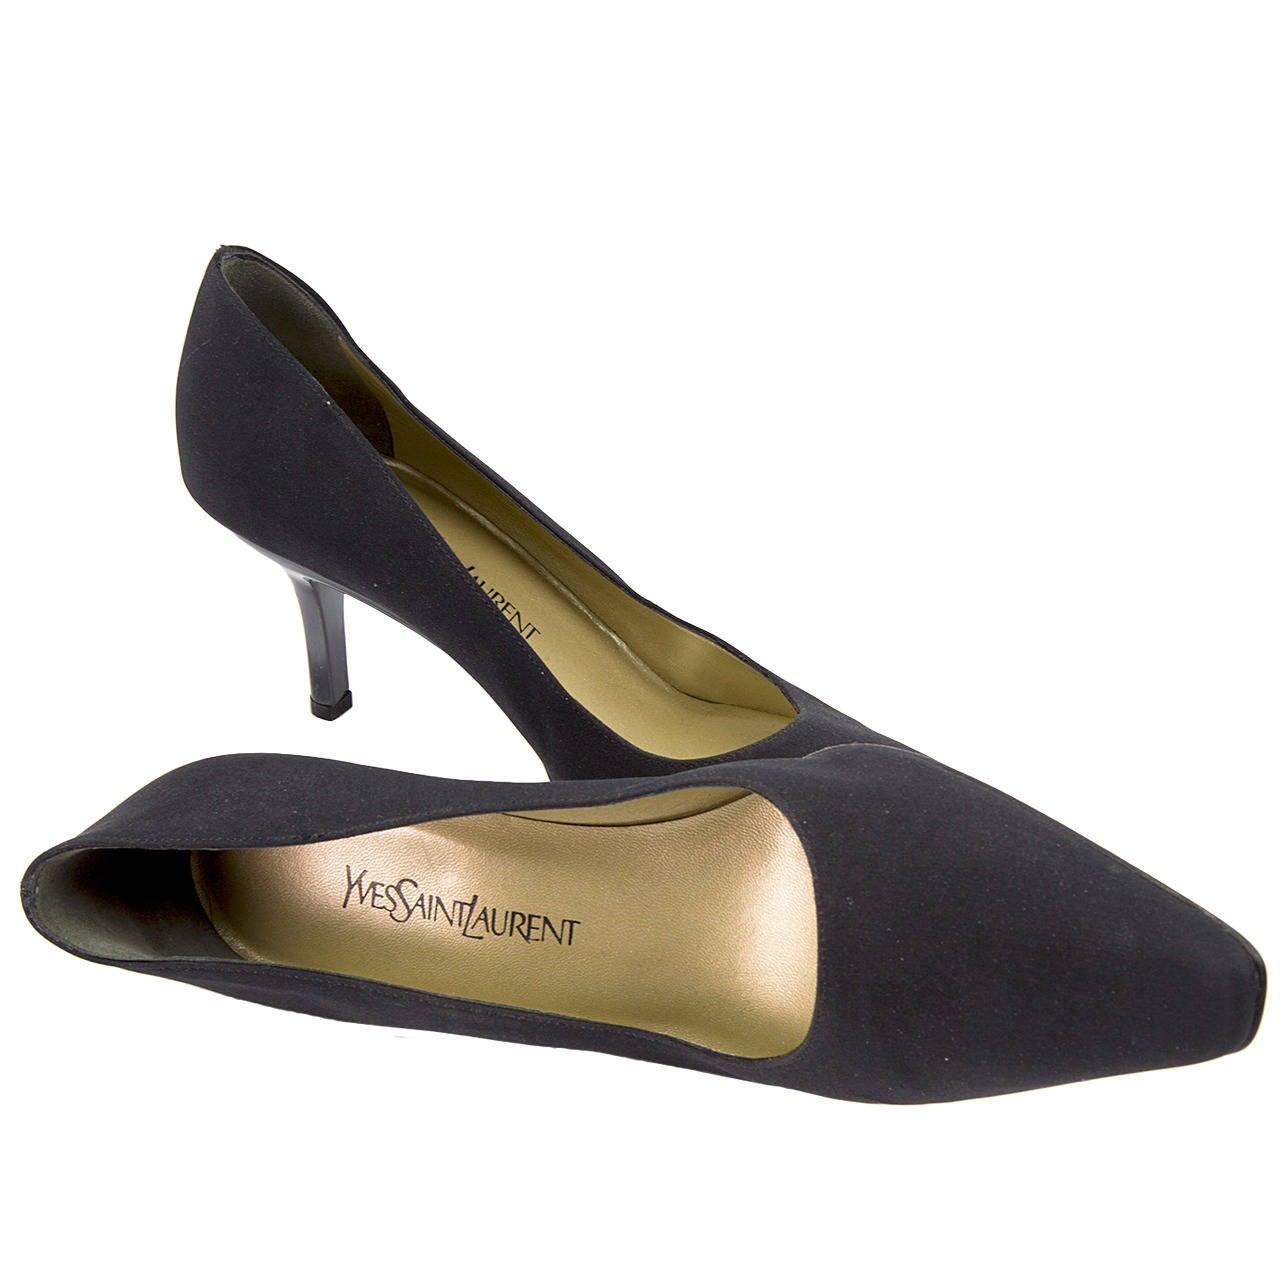 Yves Saint Laurent Shoes Black Shantung Silk Pumps Size 39.5 Italy